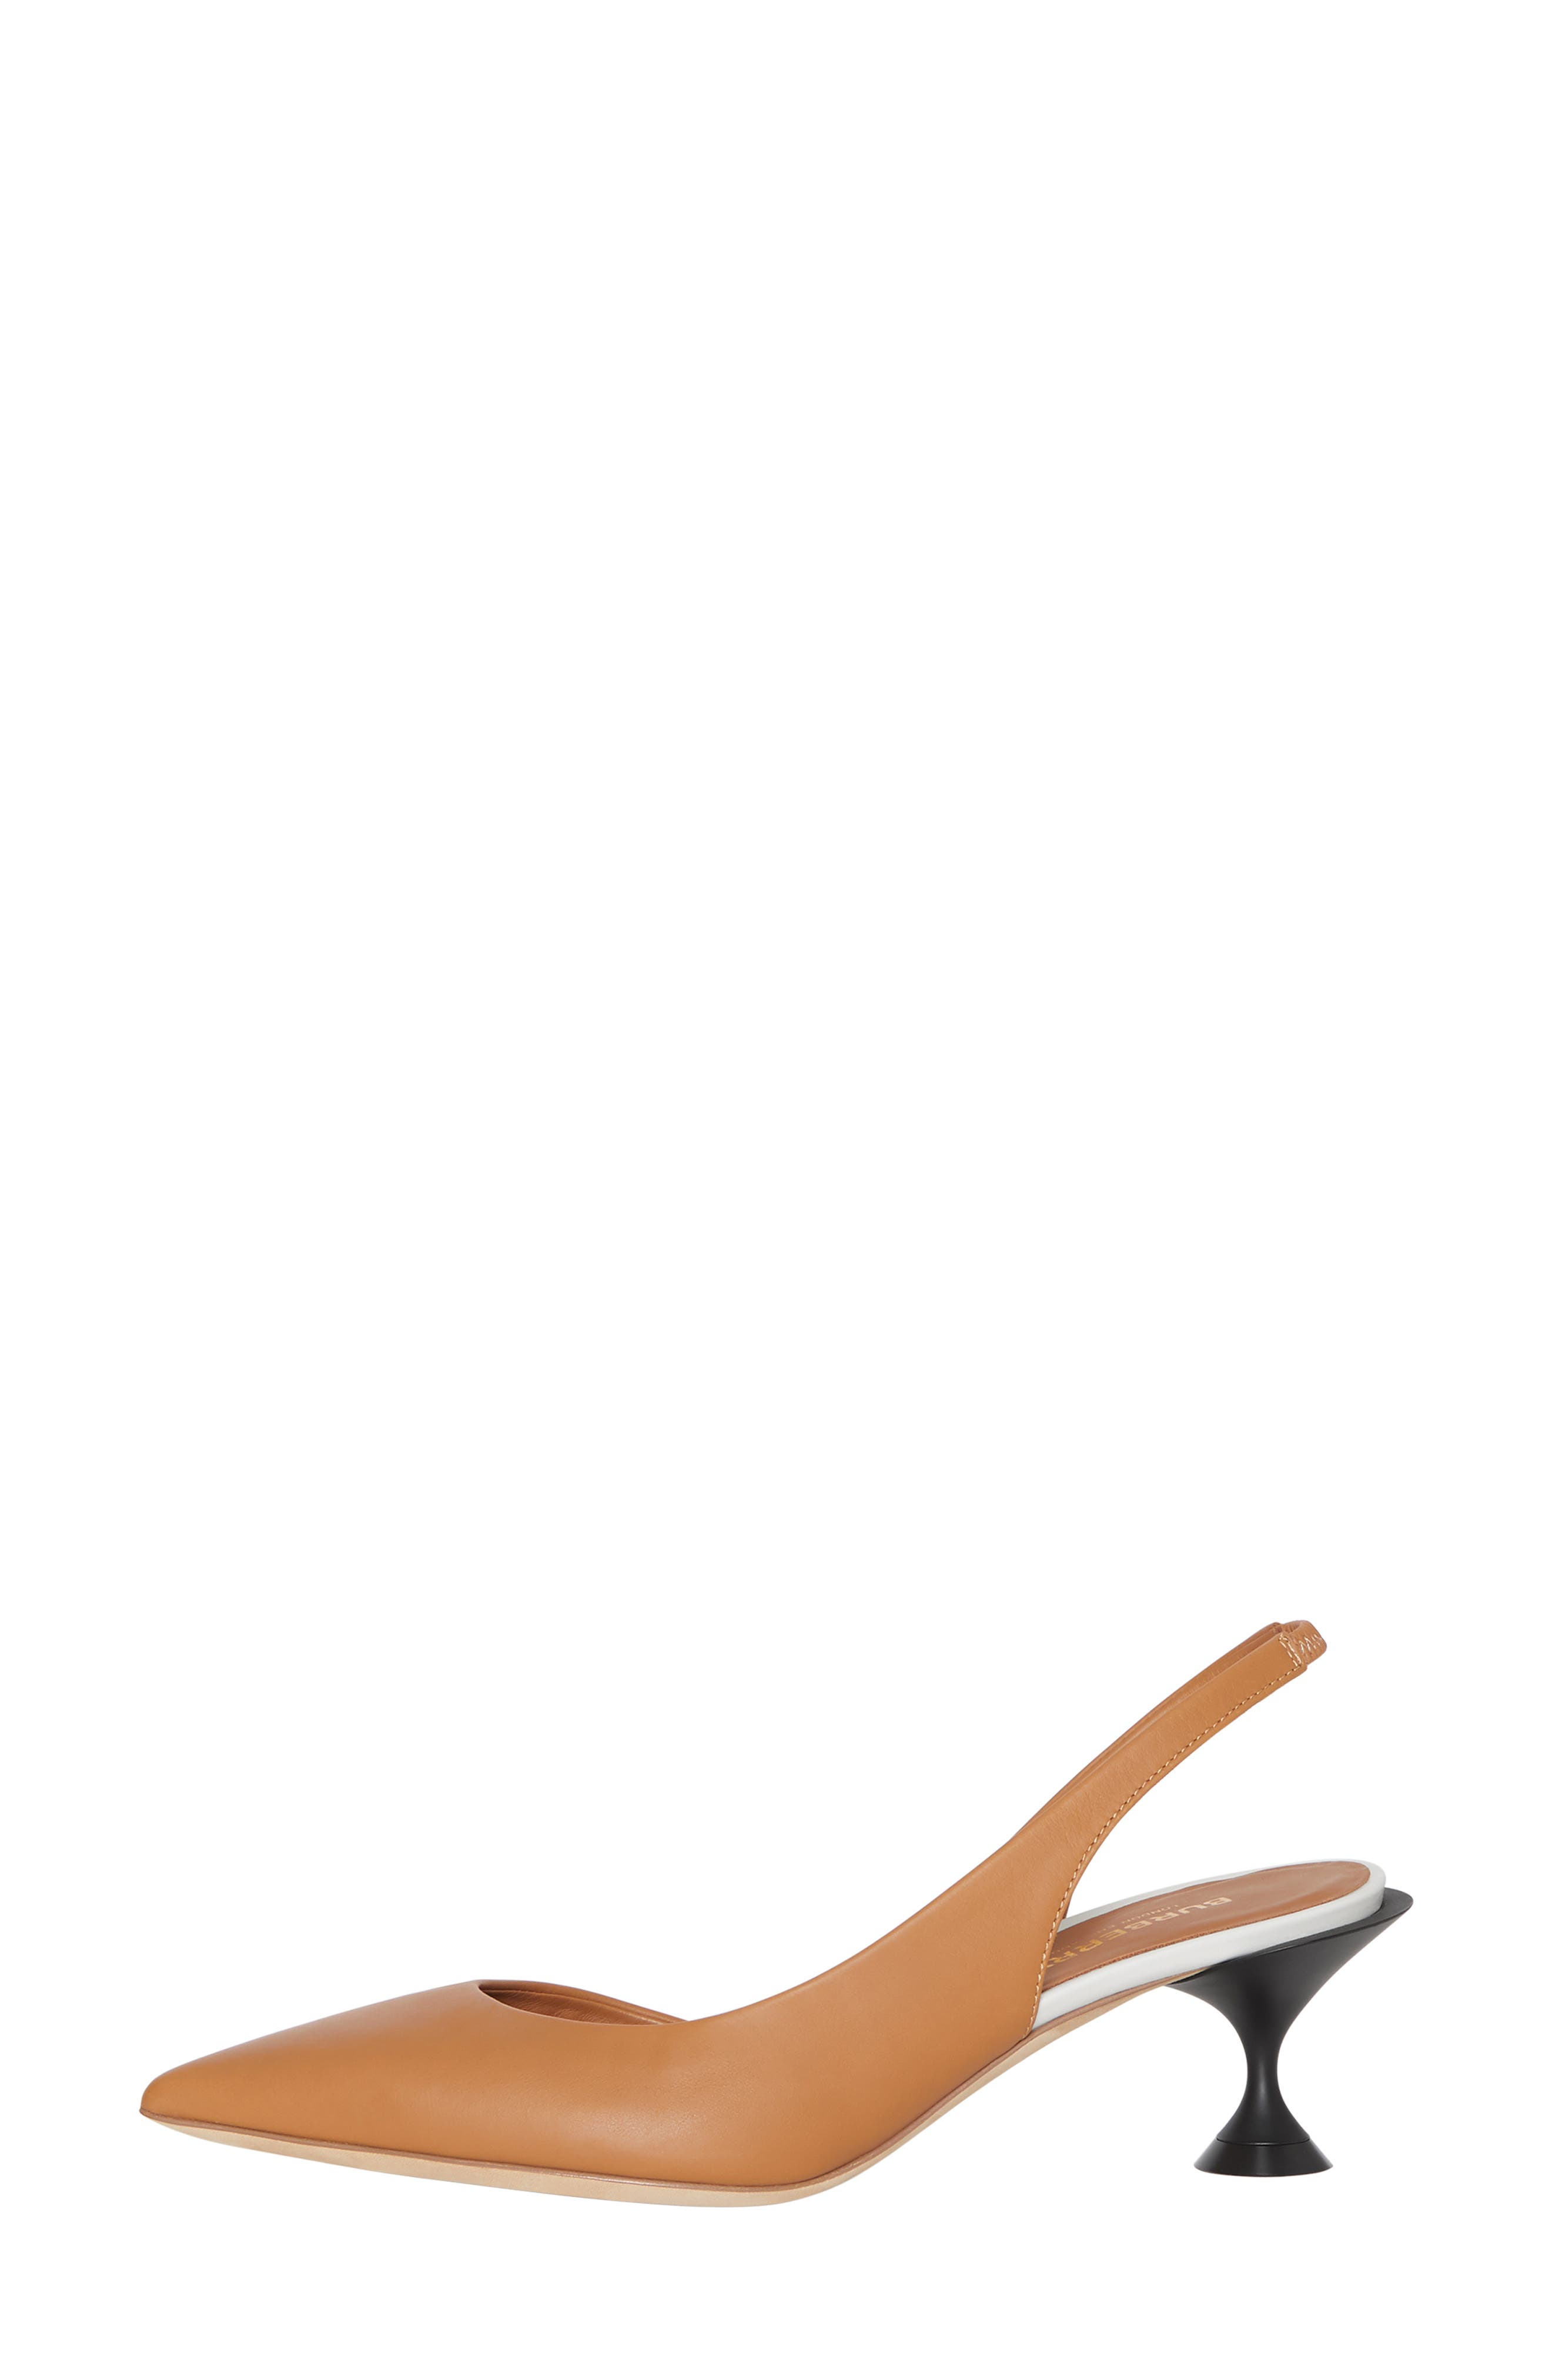 BURBERRY, Leticia Check Slingback Pump, Alternate thumbnail 3, color, CAMEL